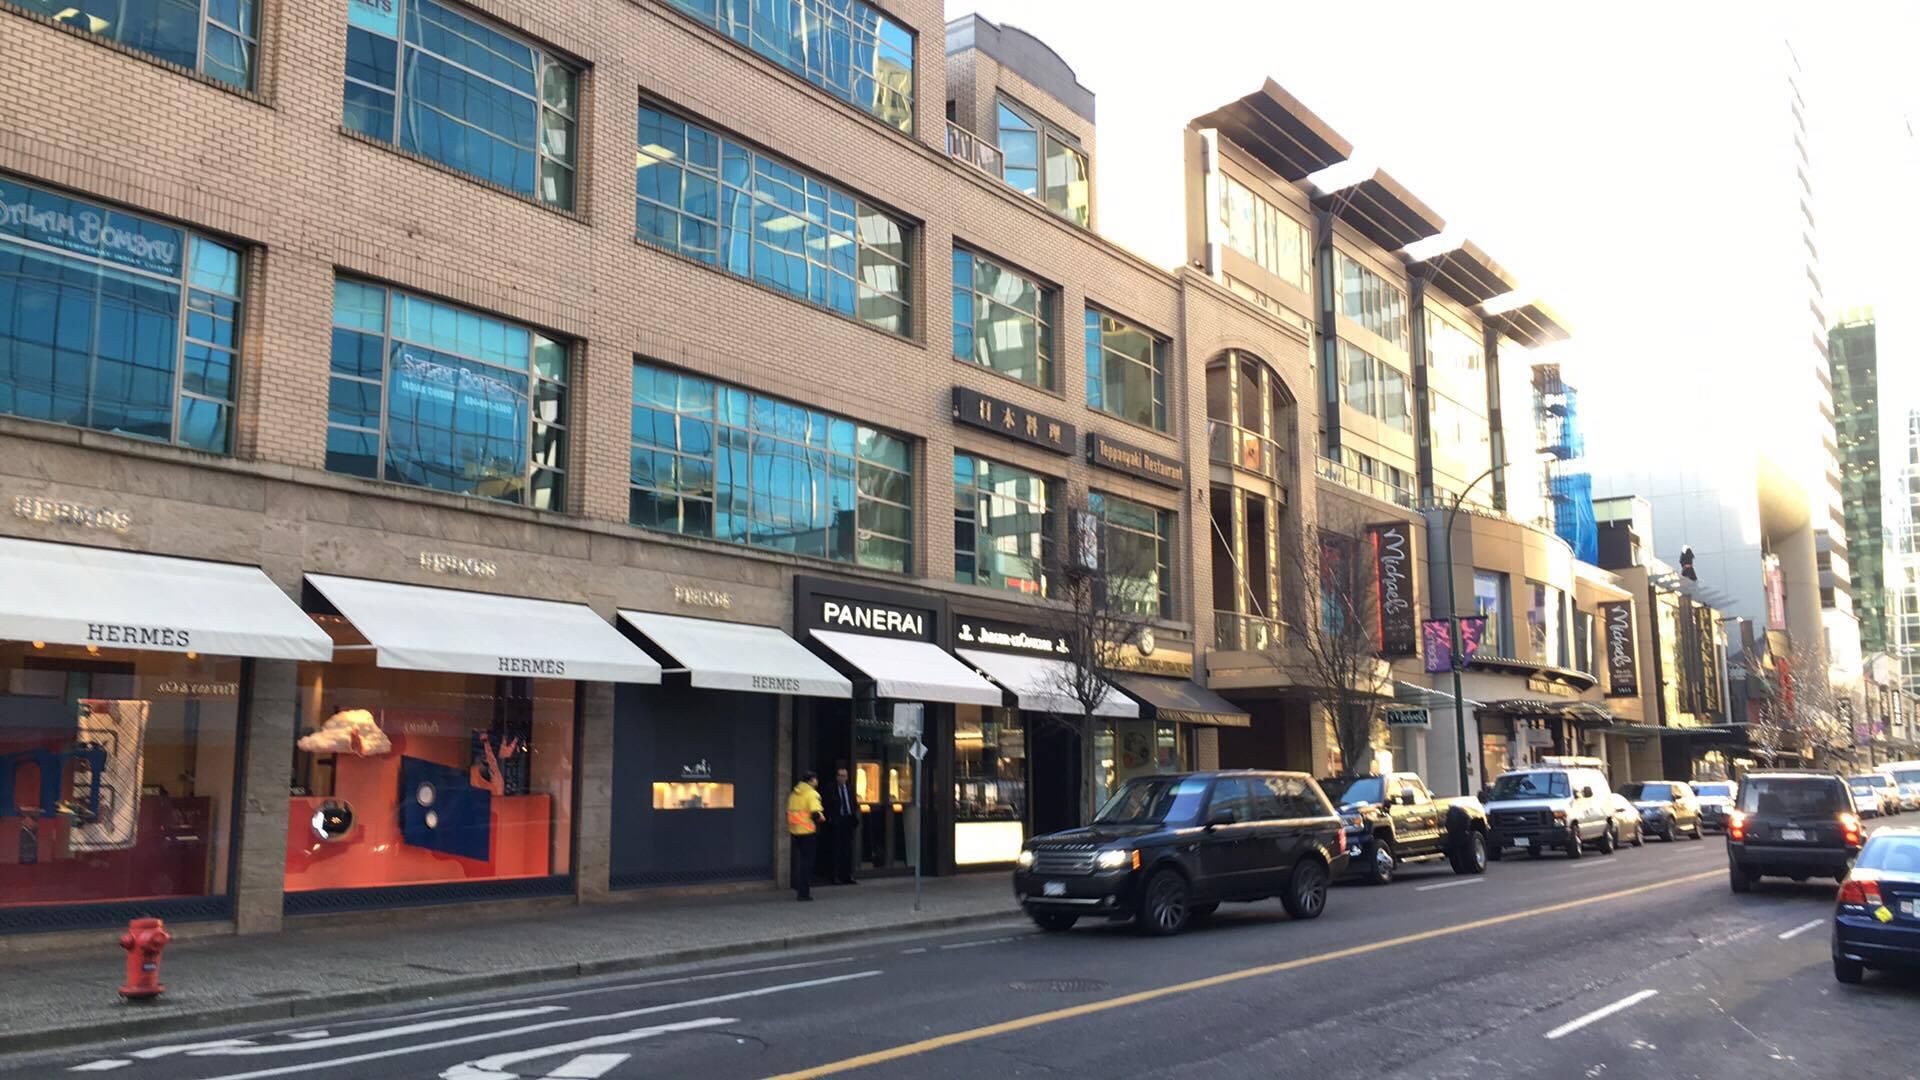 (Looking down Alberni Street from the Tiffany & Co. at the corner of Burrard Street.Photo: Lee Rivett)